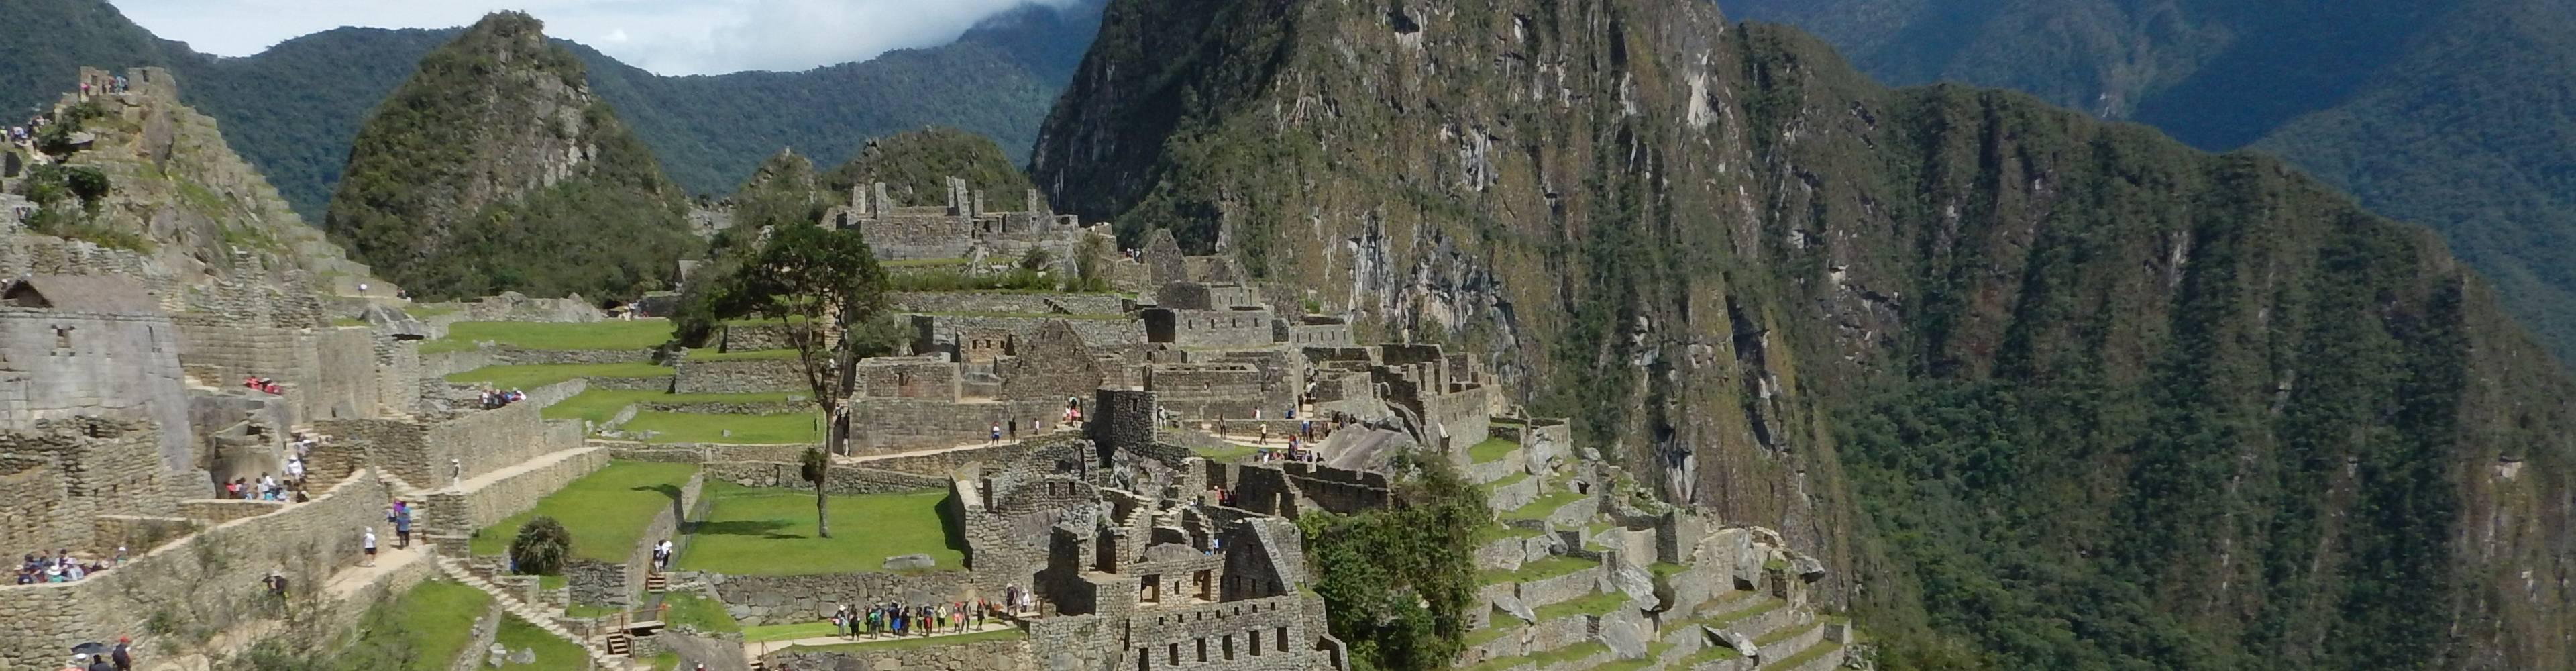 virmuze museum Ancient Peruvian Mysteries main banner